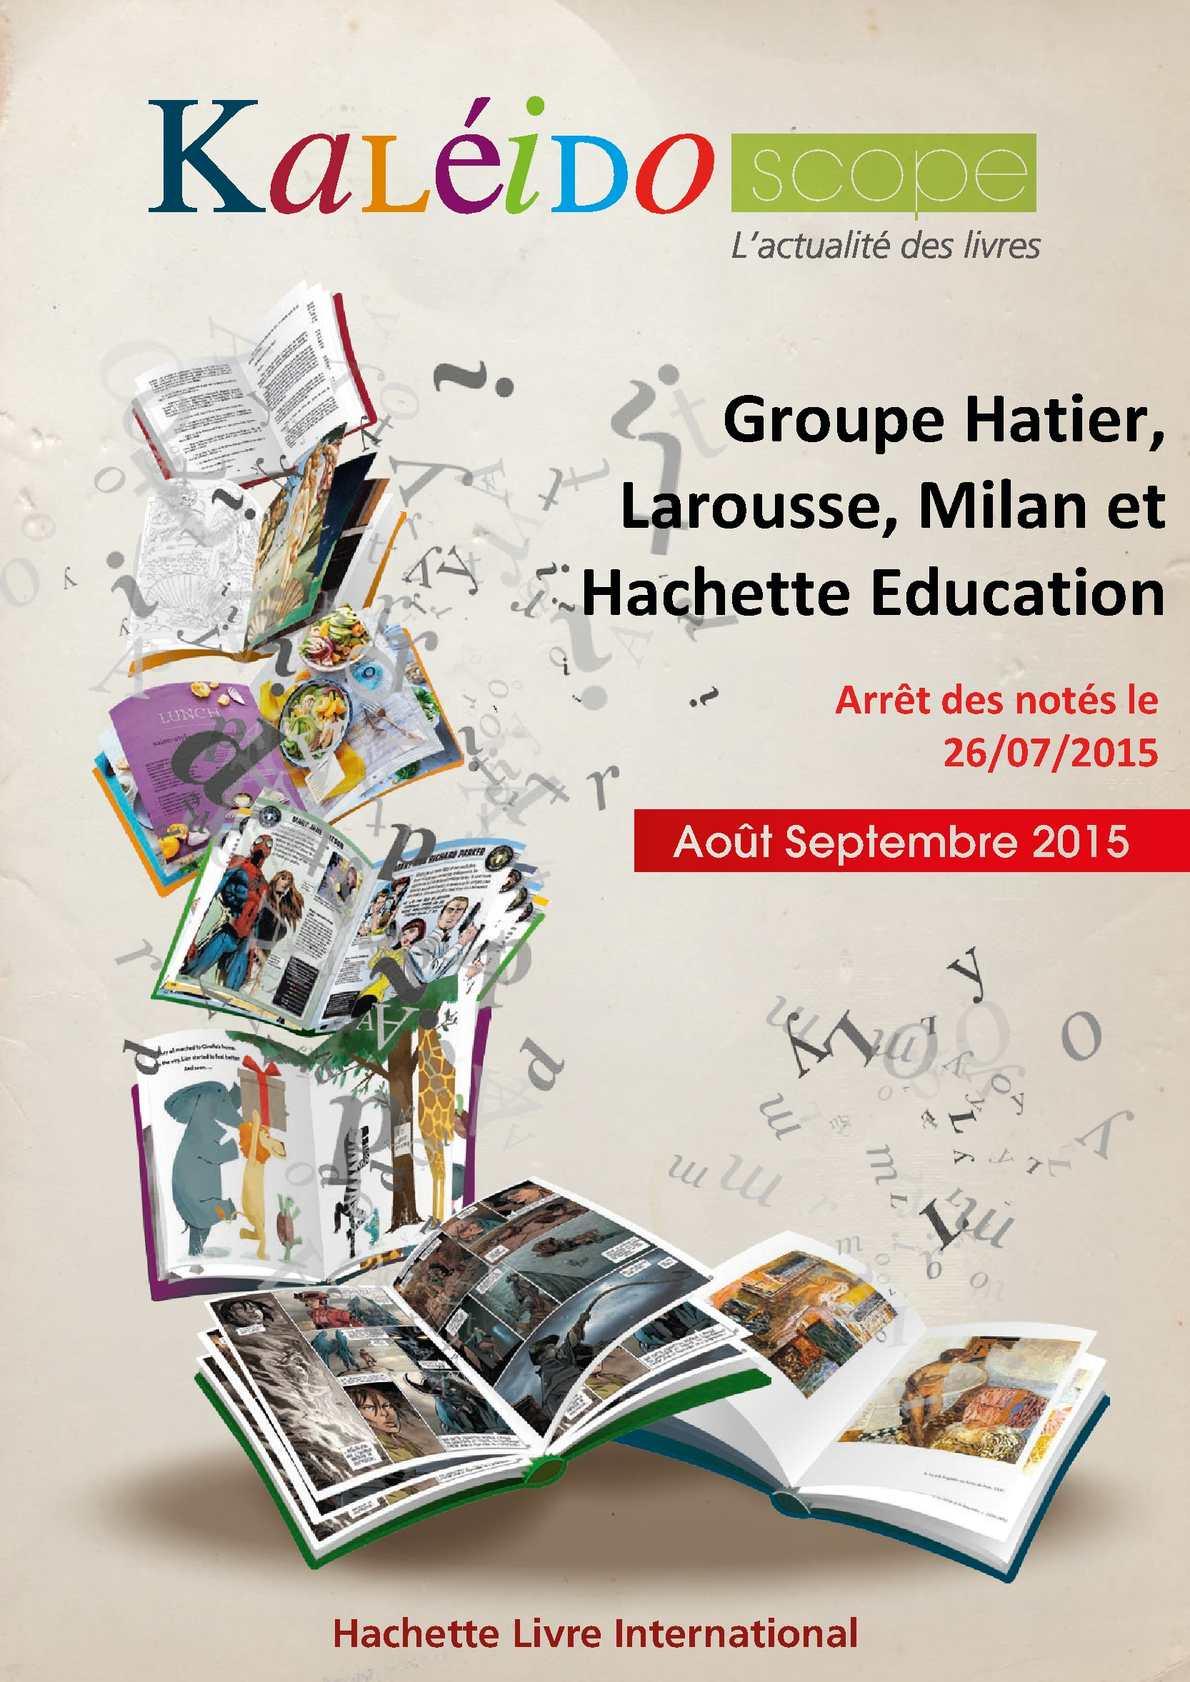 Salle De Bain Pluriel Larousse ~ Calam O Kaleidoscope Aout Septembre 2015 Hatier Larousse Milan